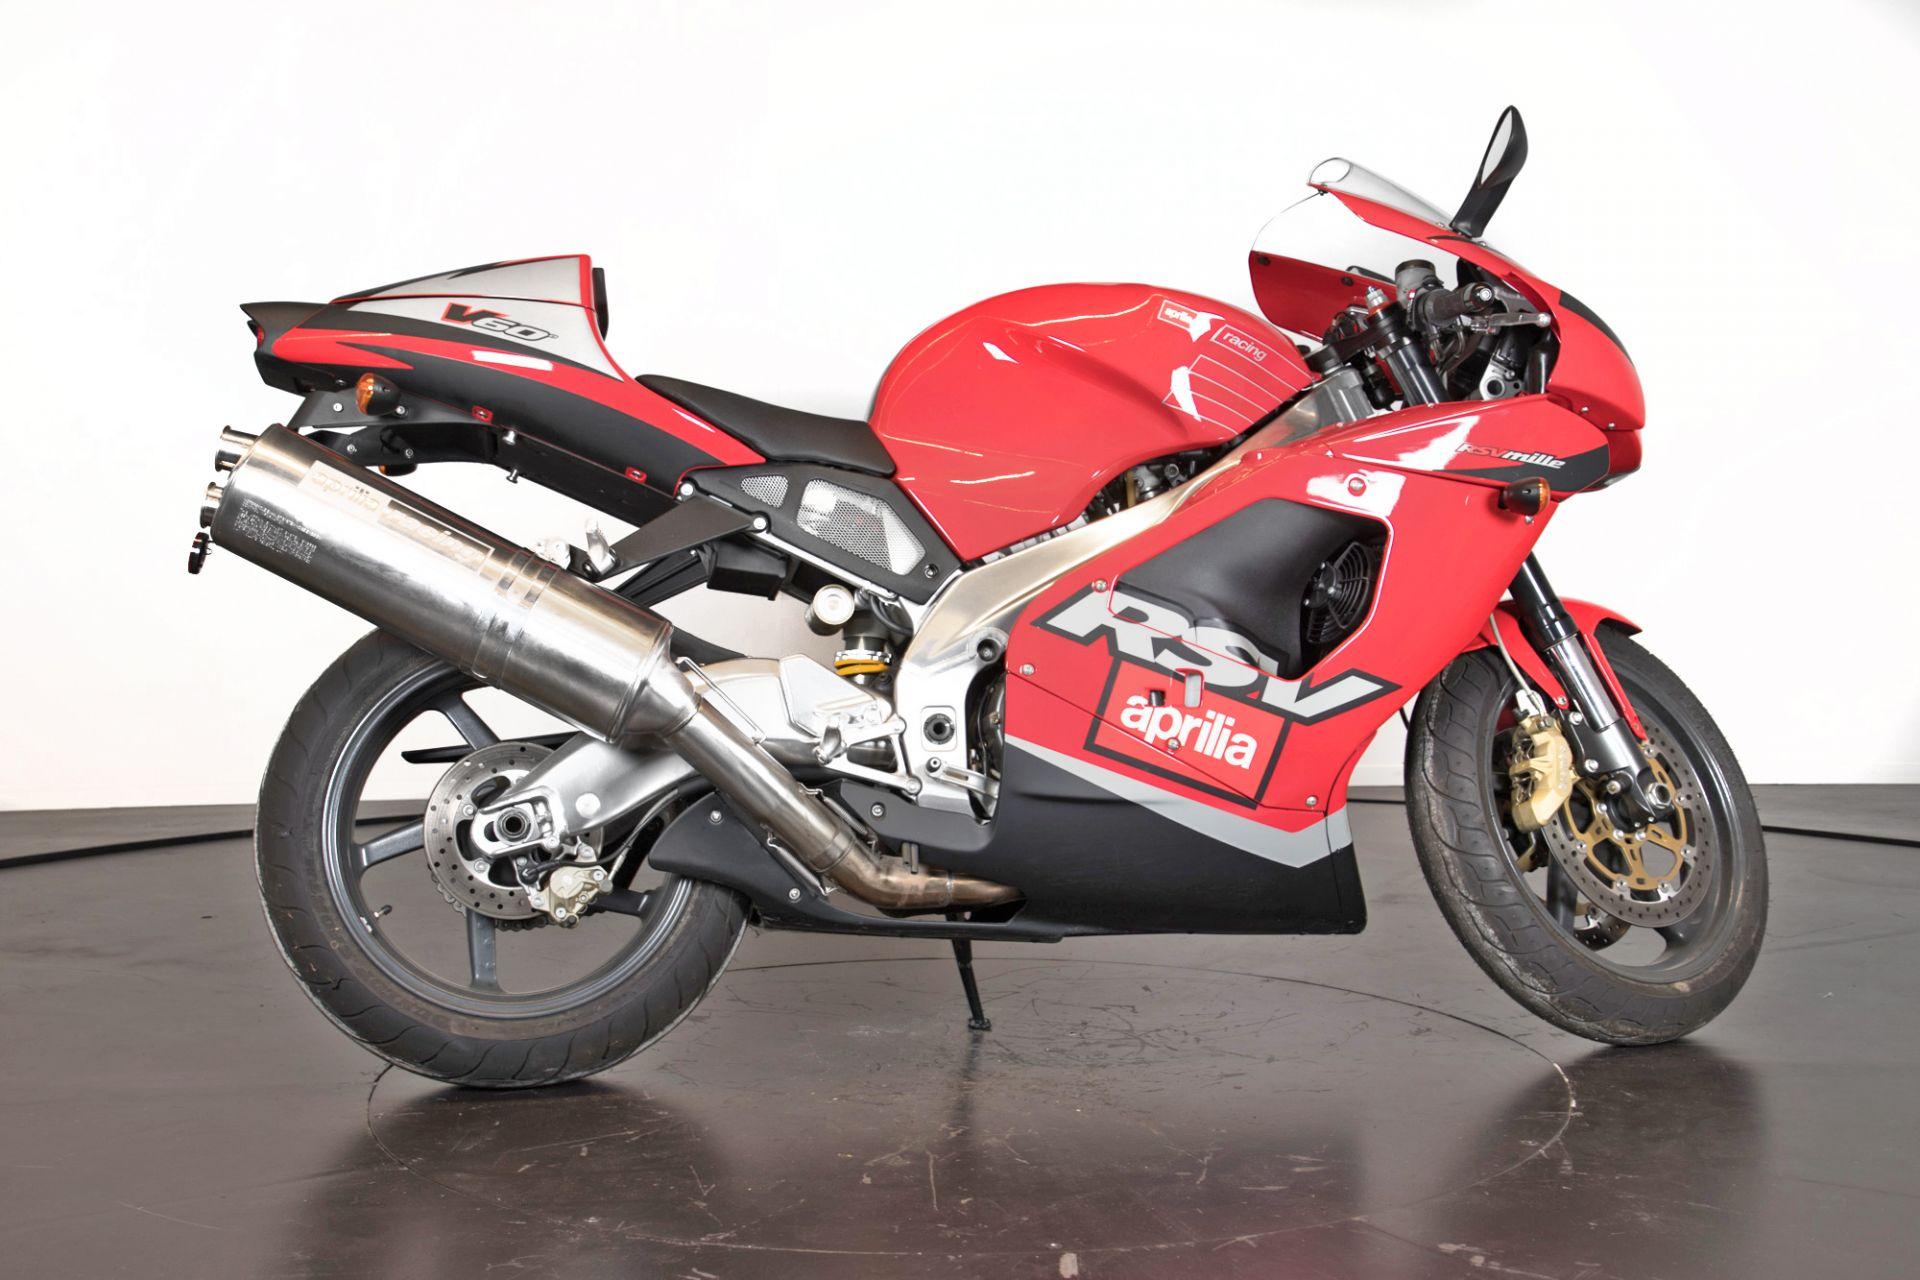 2000 Aprilia RSV 1000 34941